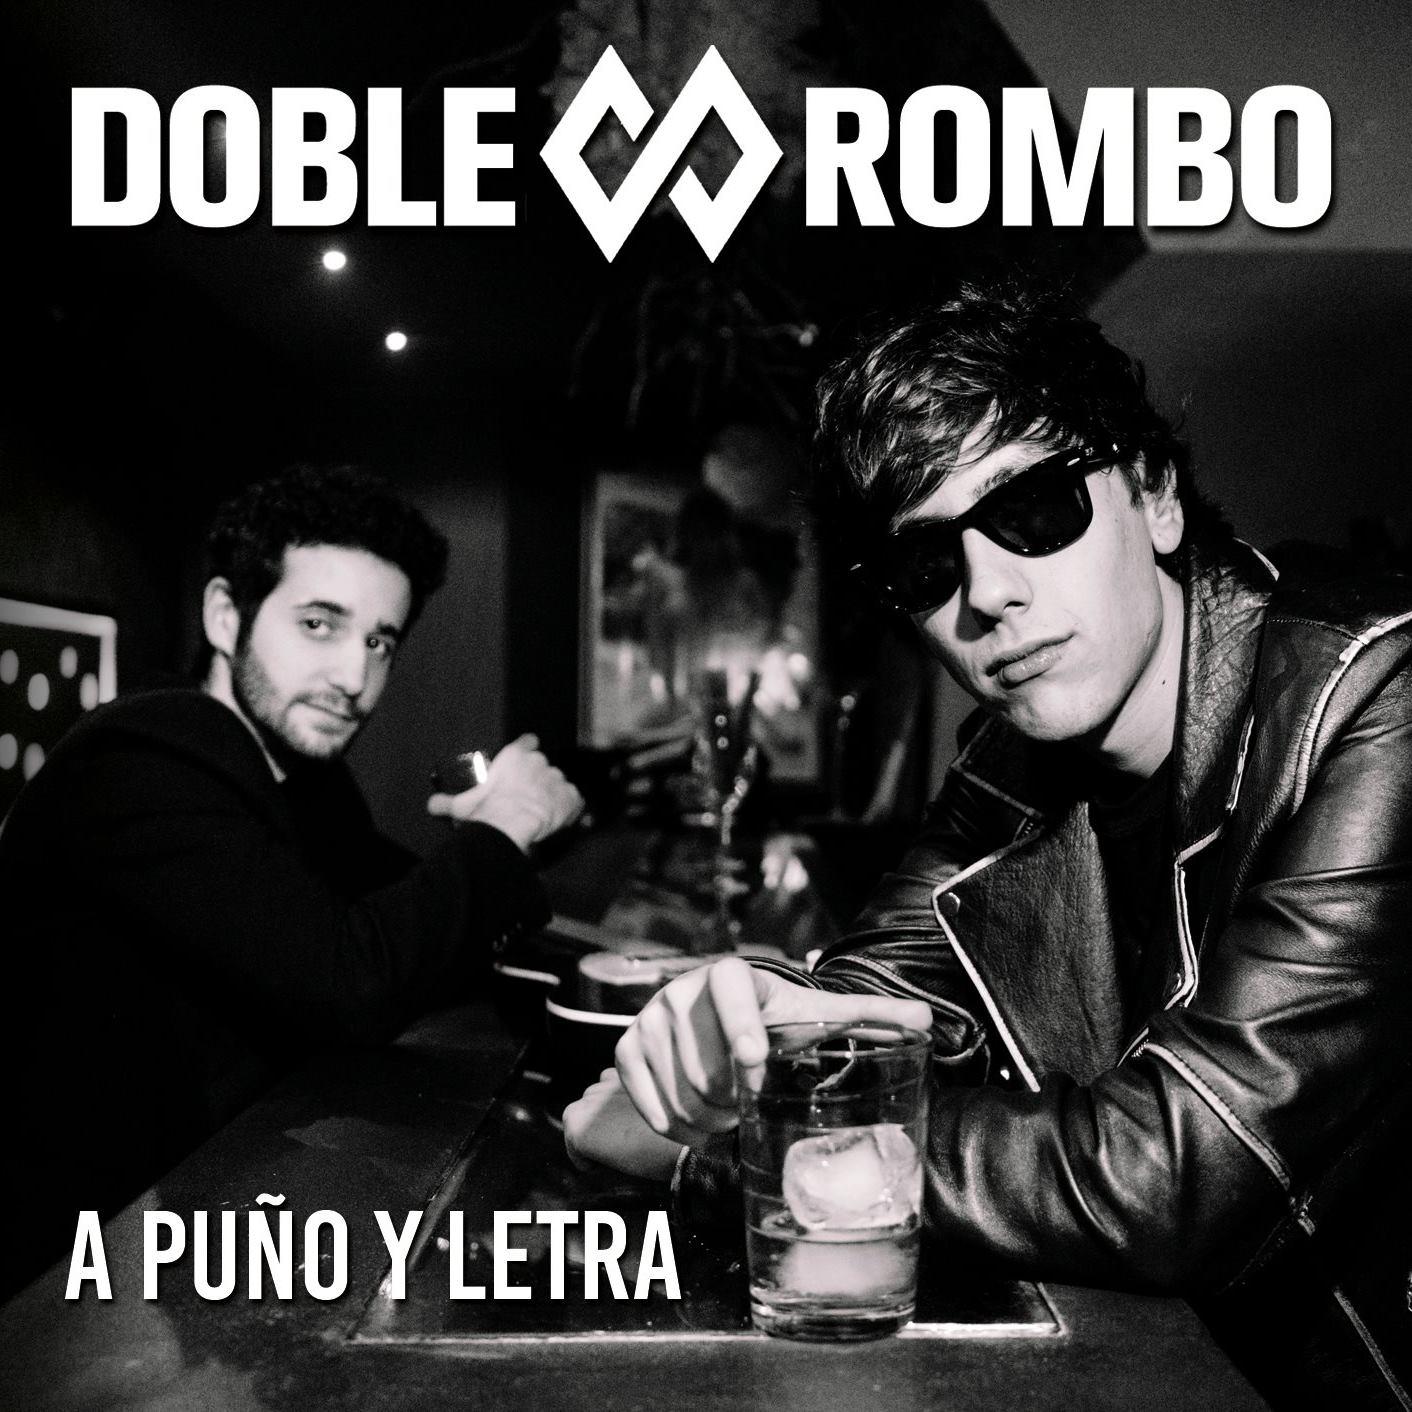 DOBLE ROMBO amplían fechas de presentación de su álbum